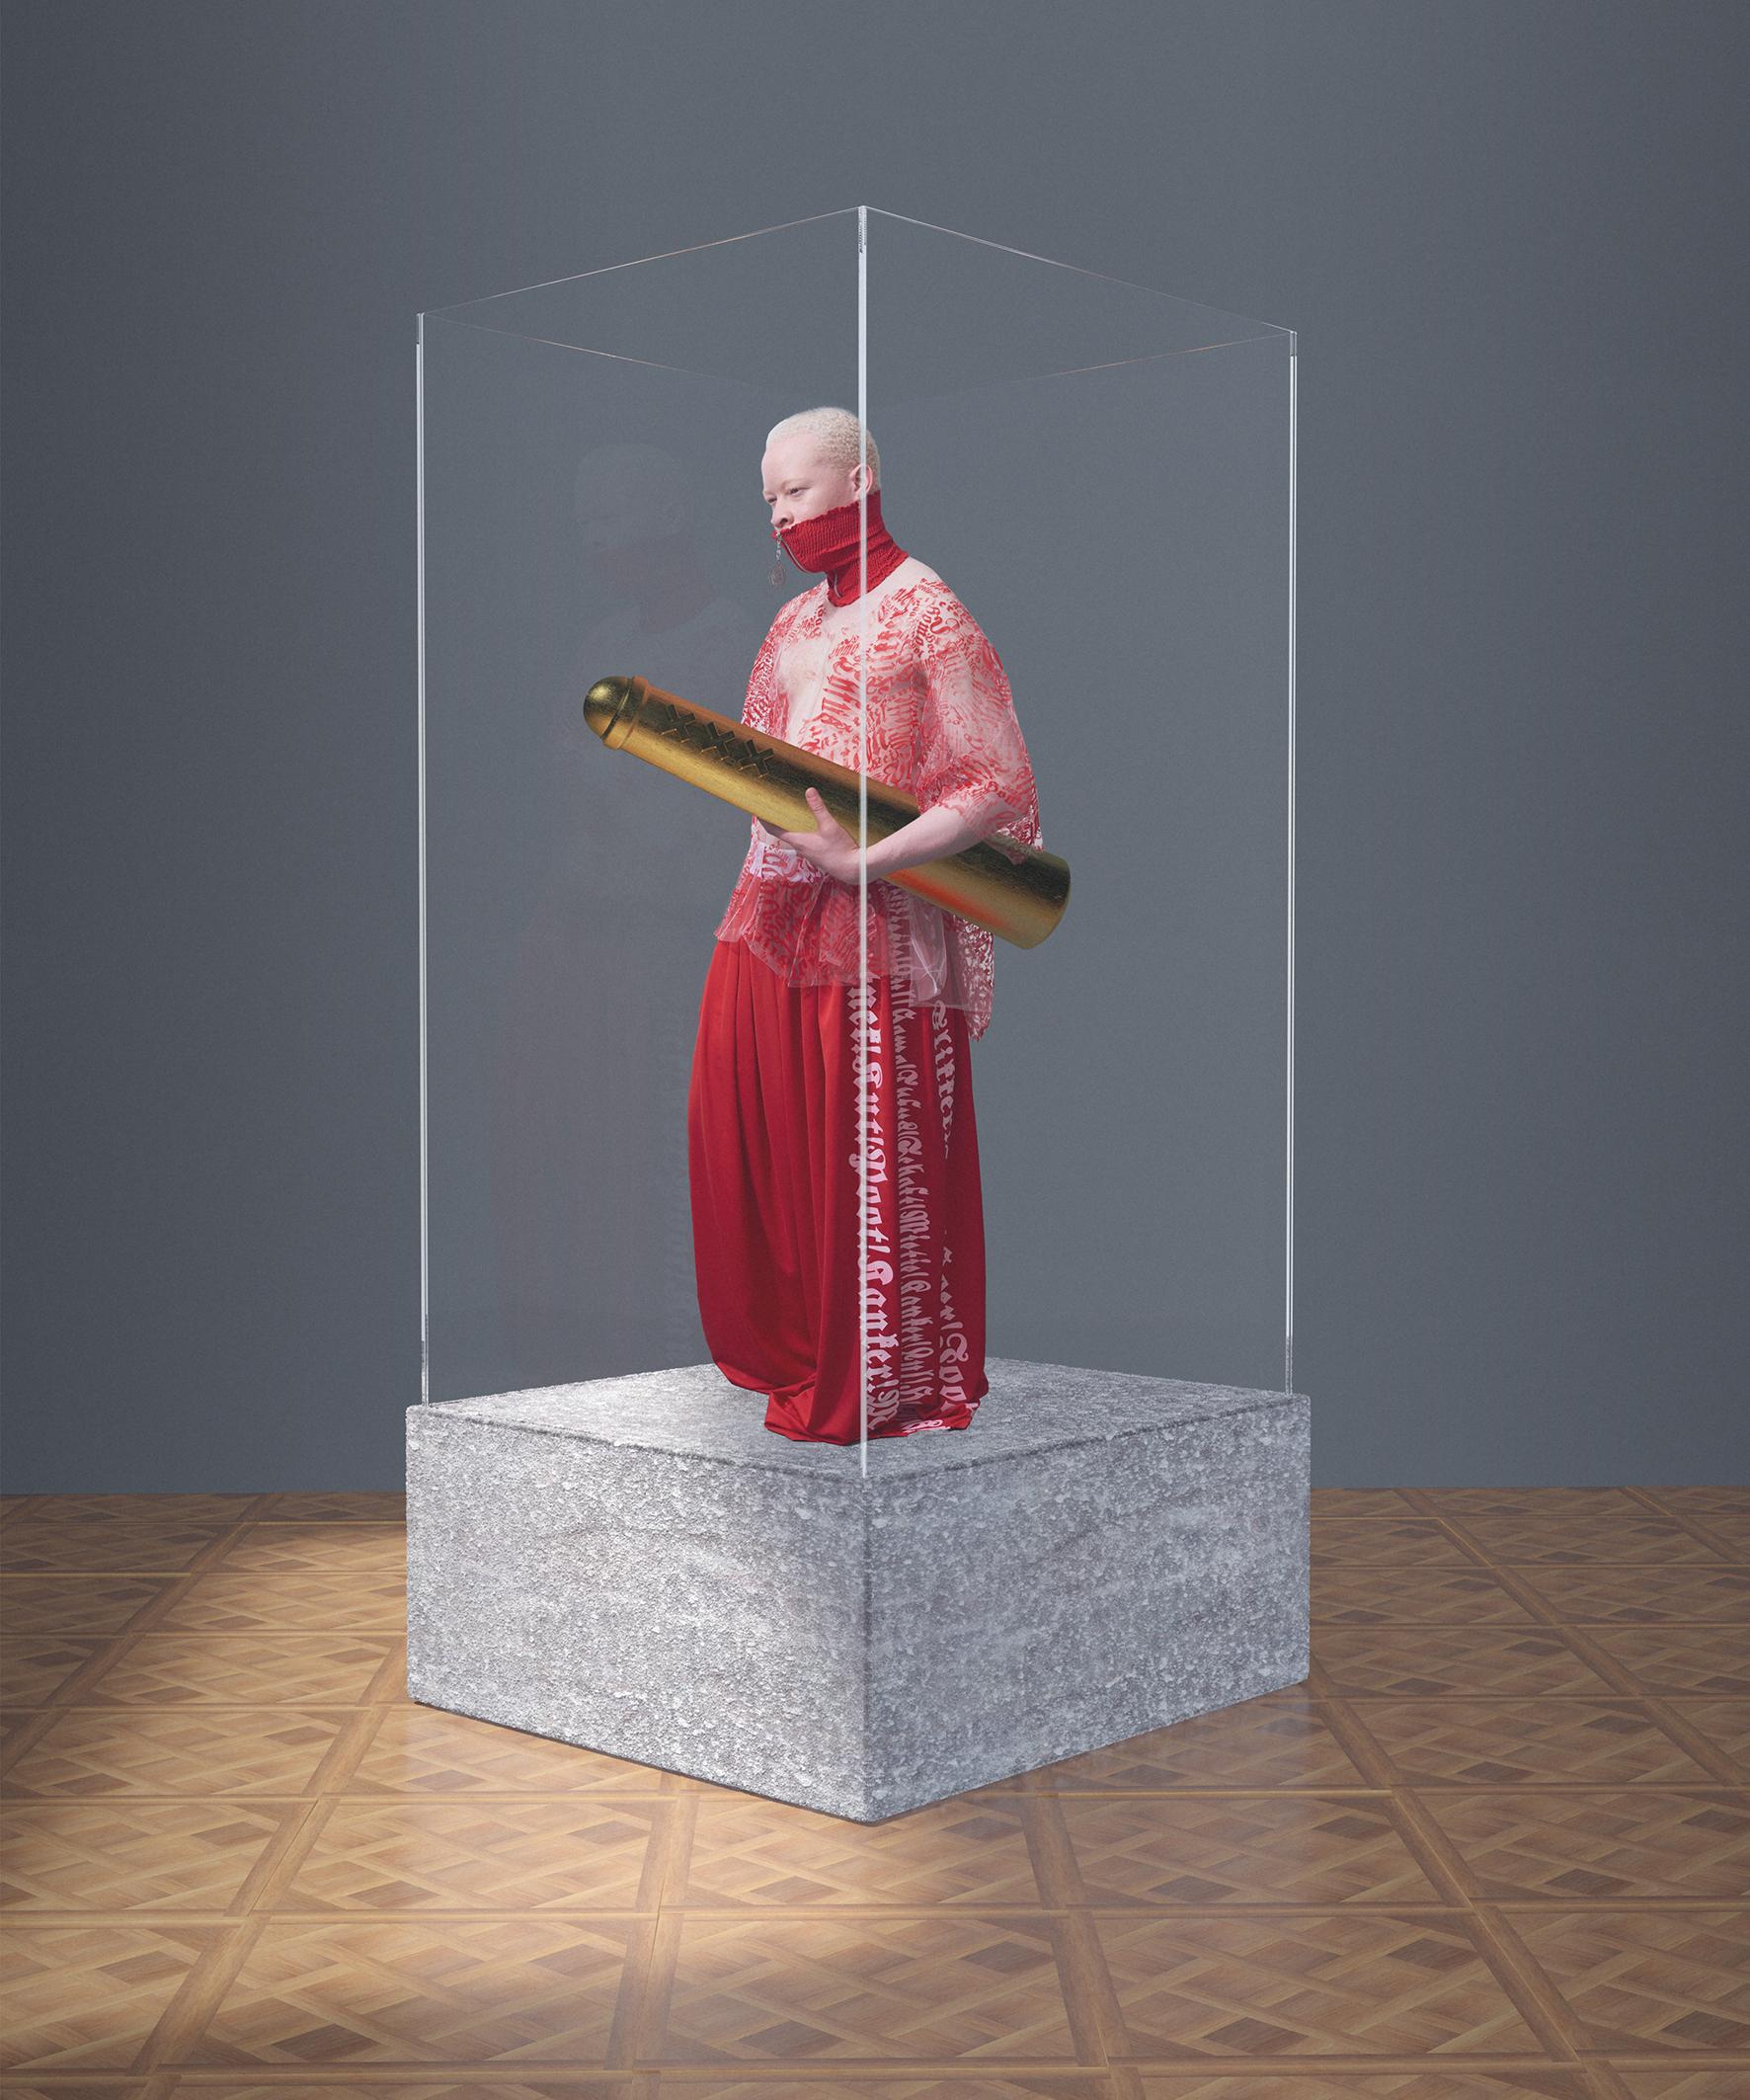 Albino in vitrine, in samenwerking met Willem Stapel